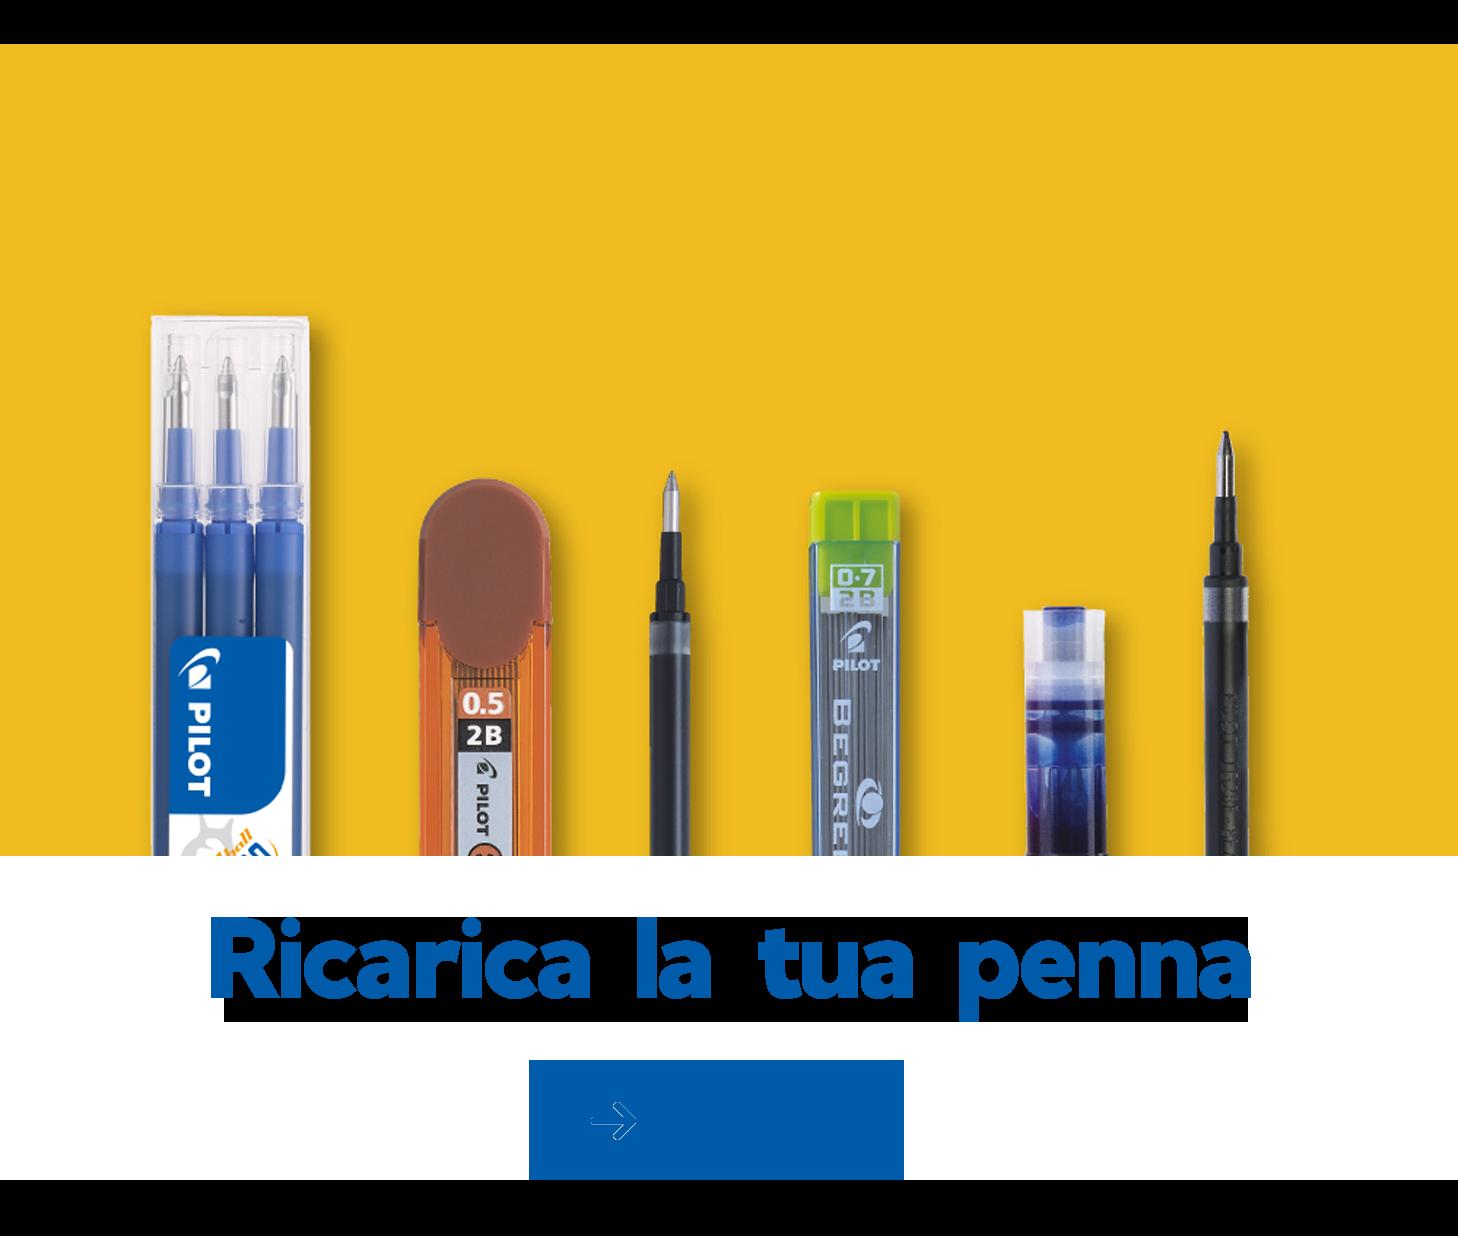 Ricarica la tua penna